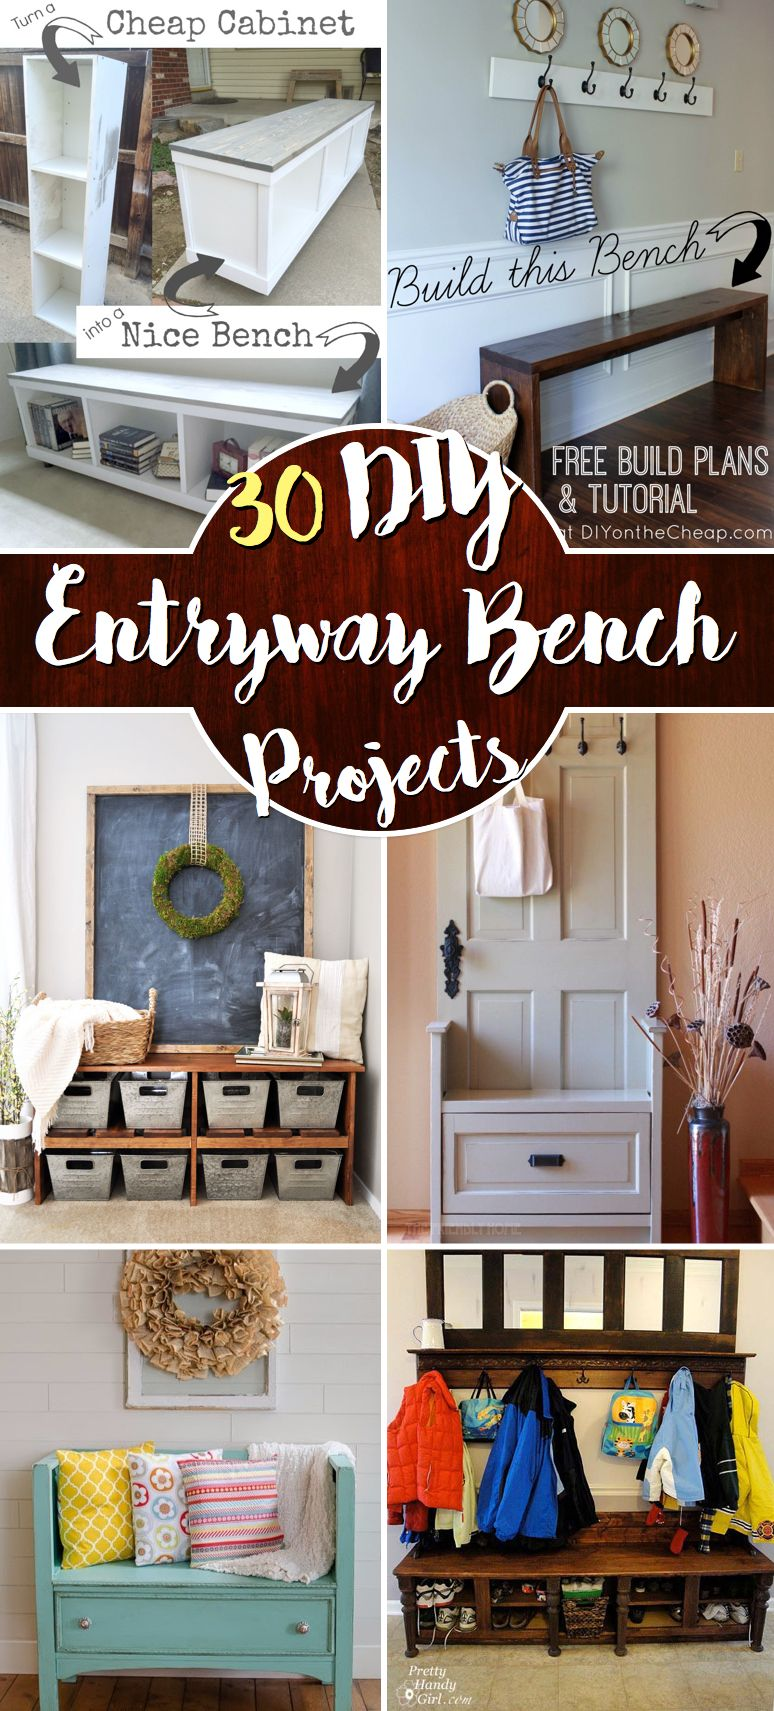 Corner hallway storage cabinet  The Best  DIY Entryway Bench Projects  DIY  Pinterest  Entryway